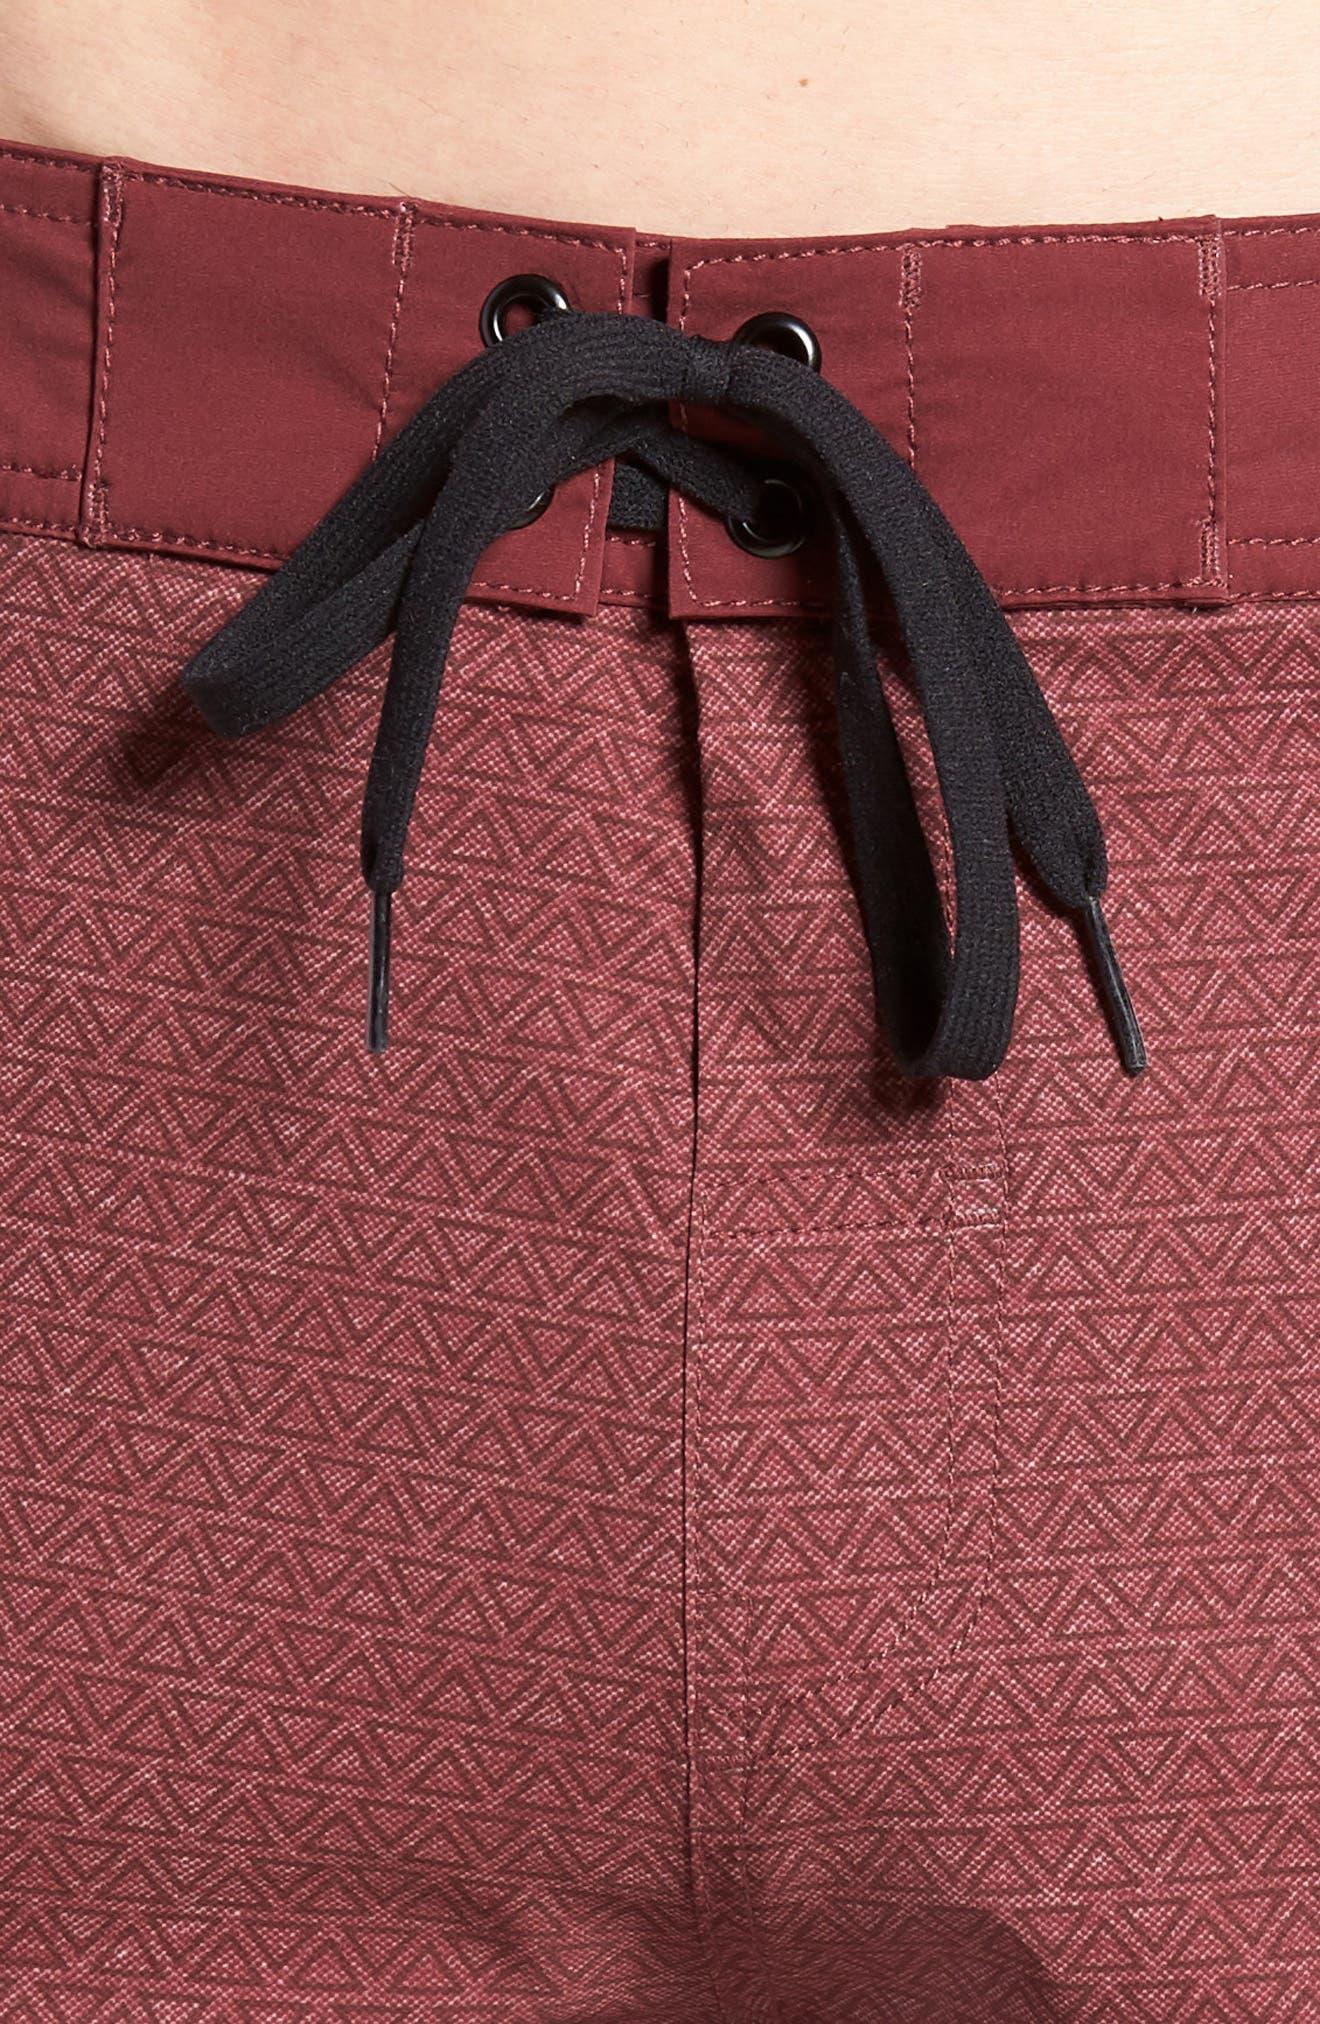 Blanders Regular Fit Board Shorts,                             Alternate thumbnail 4, color,                             Oxblood